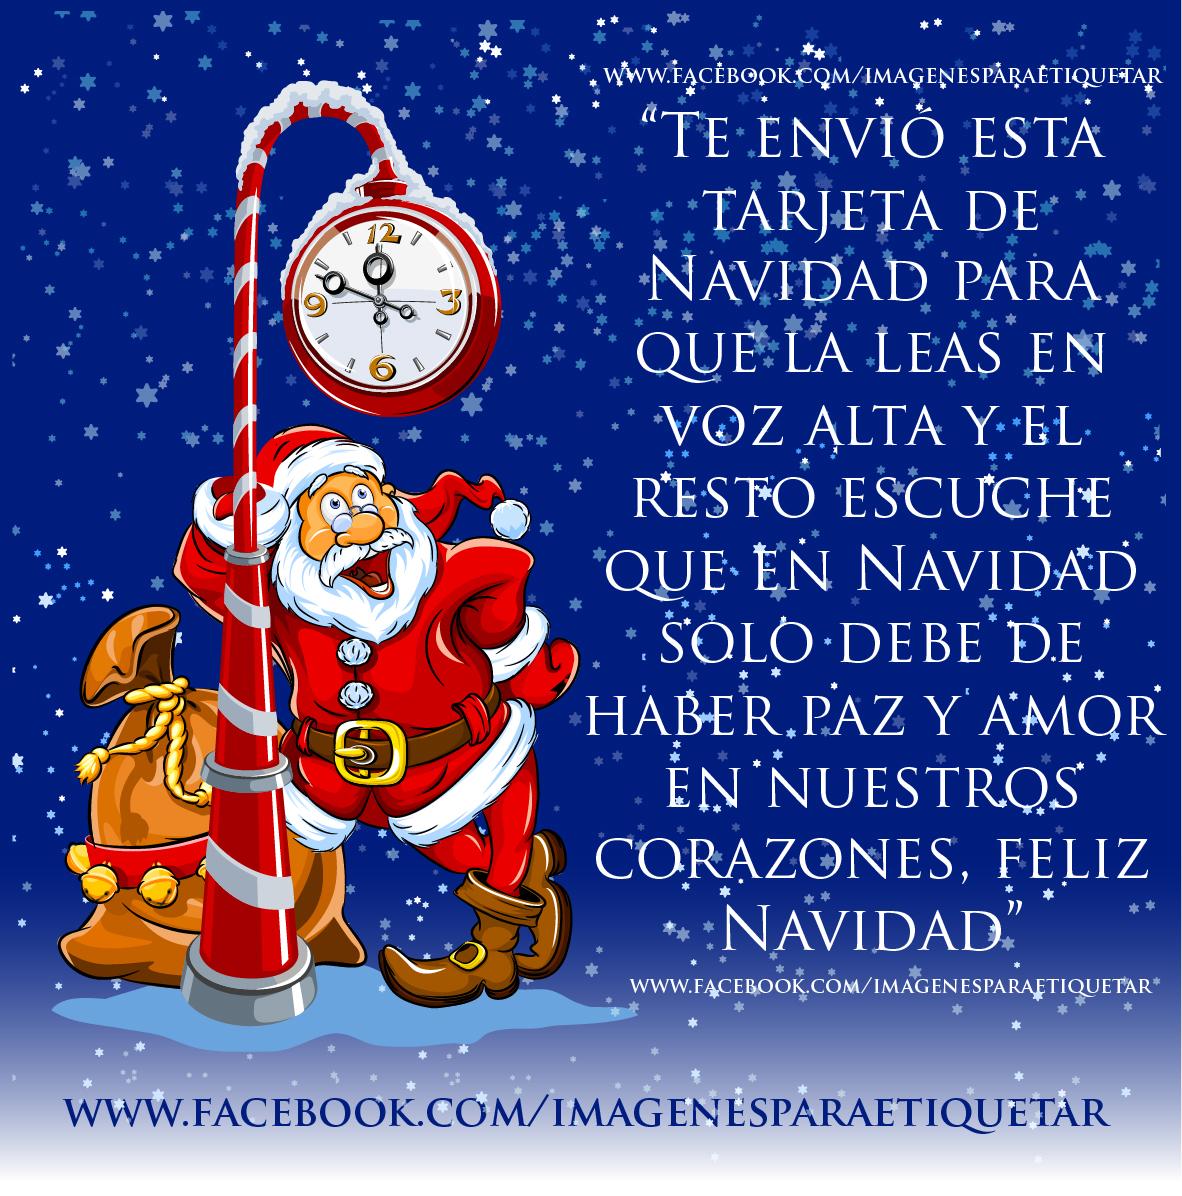 Feliz navidad 2015 frases mensajes imagenes tarjetas - Feliz navidad frases ...